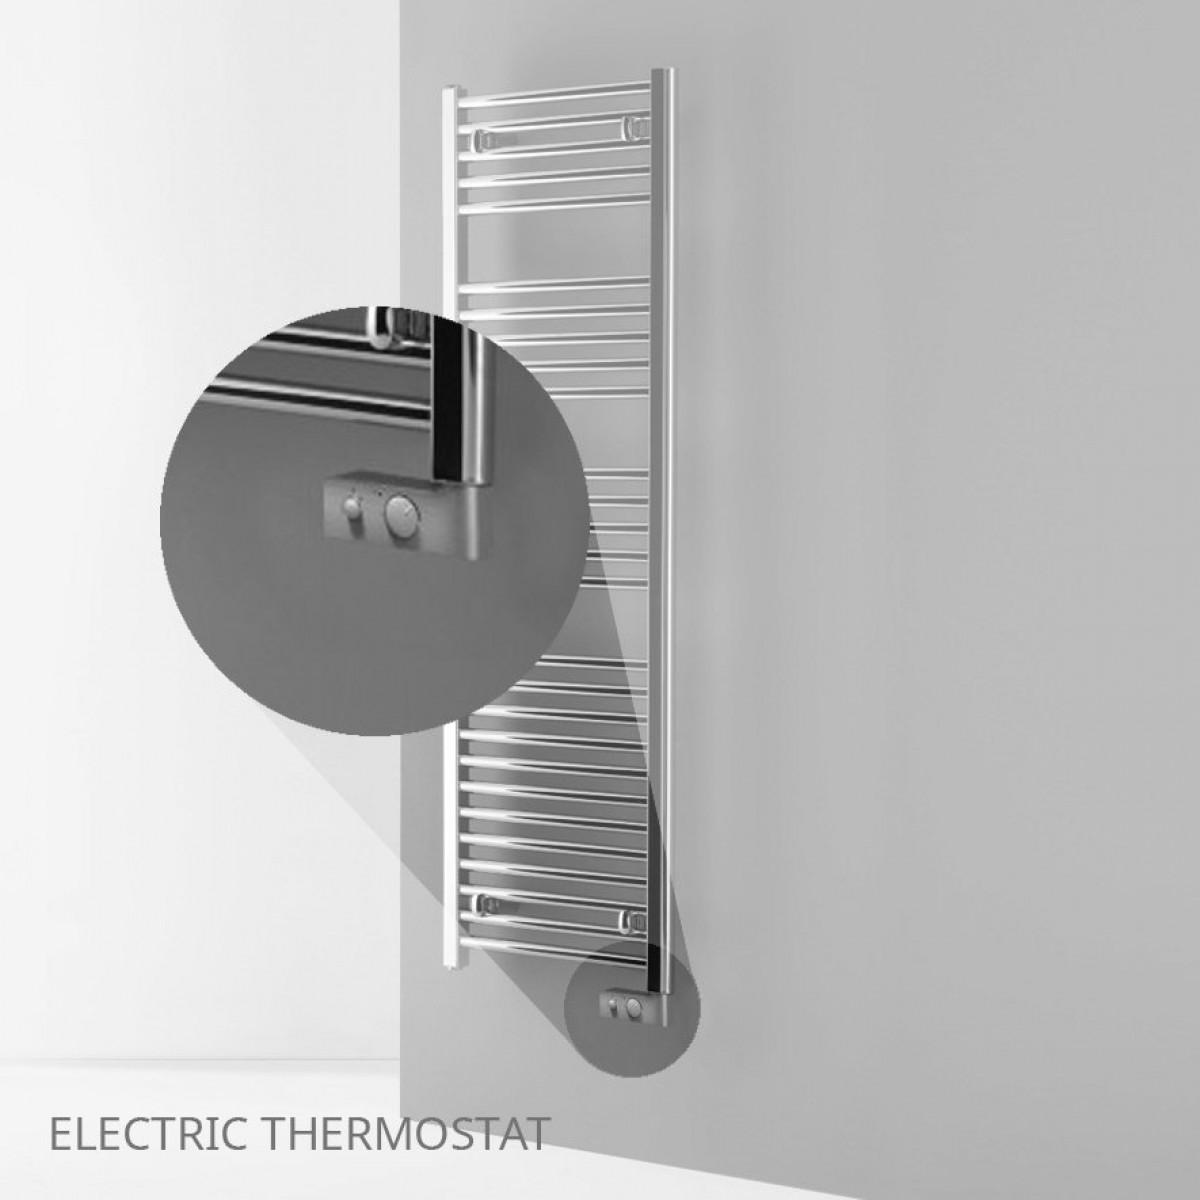 Heated Towel Rails Electric Chrome: Electric Chrome Thermostatic Heated Towel Rail 840 X 500mm